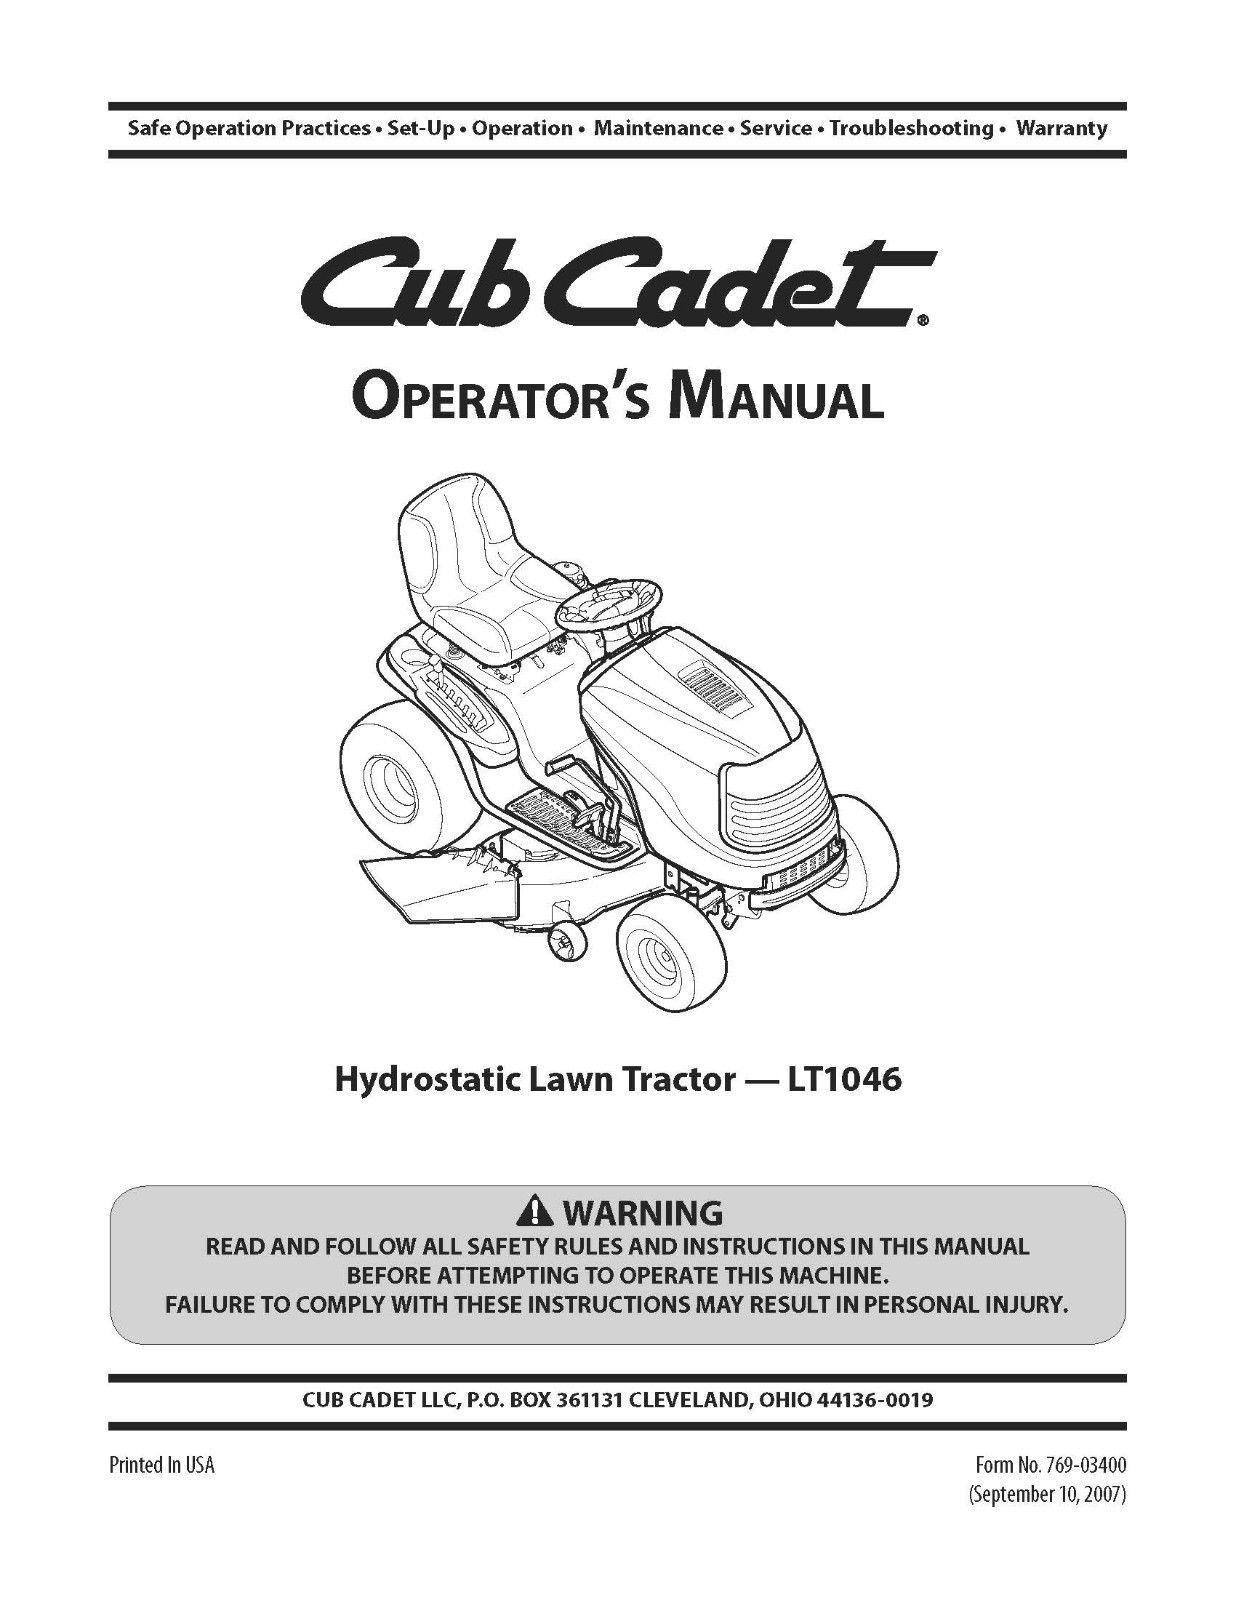 Cub Cadet Hydrostatic Lawn Tractor Operator's Manual Model No. LT1046